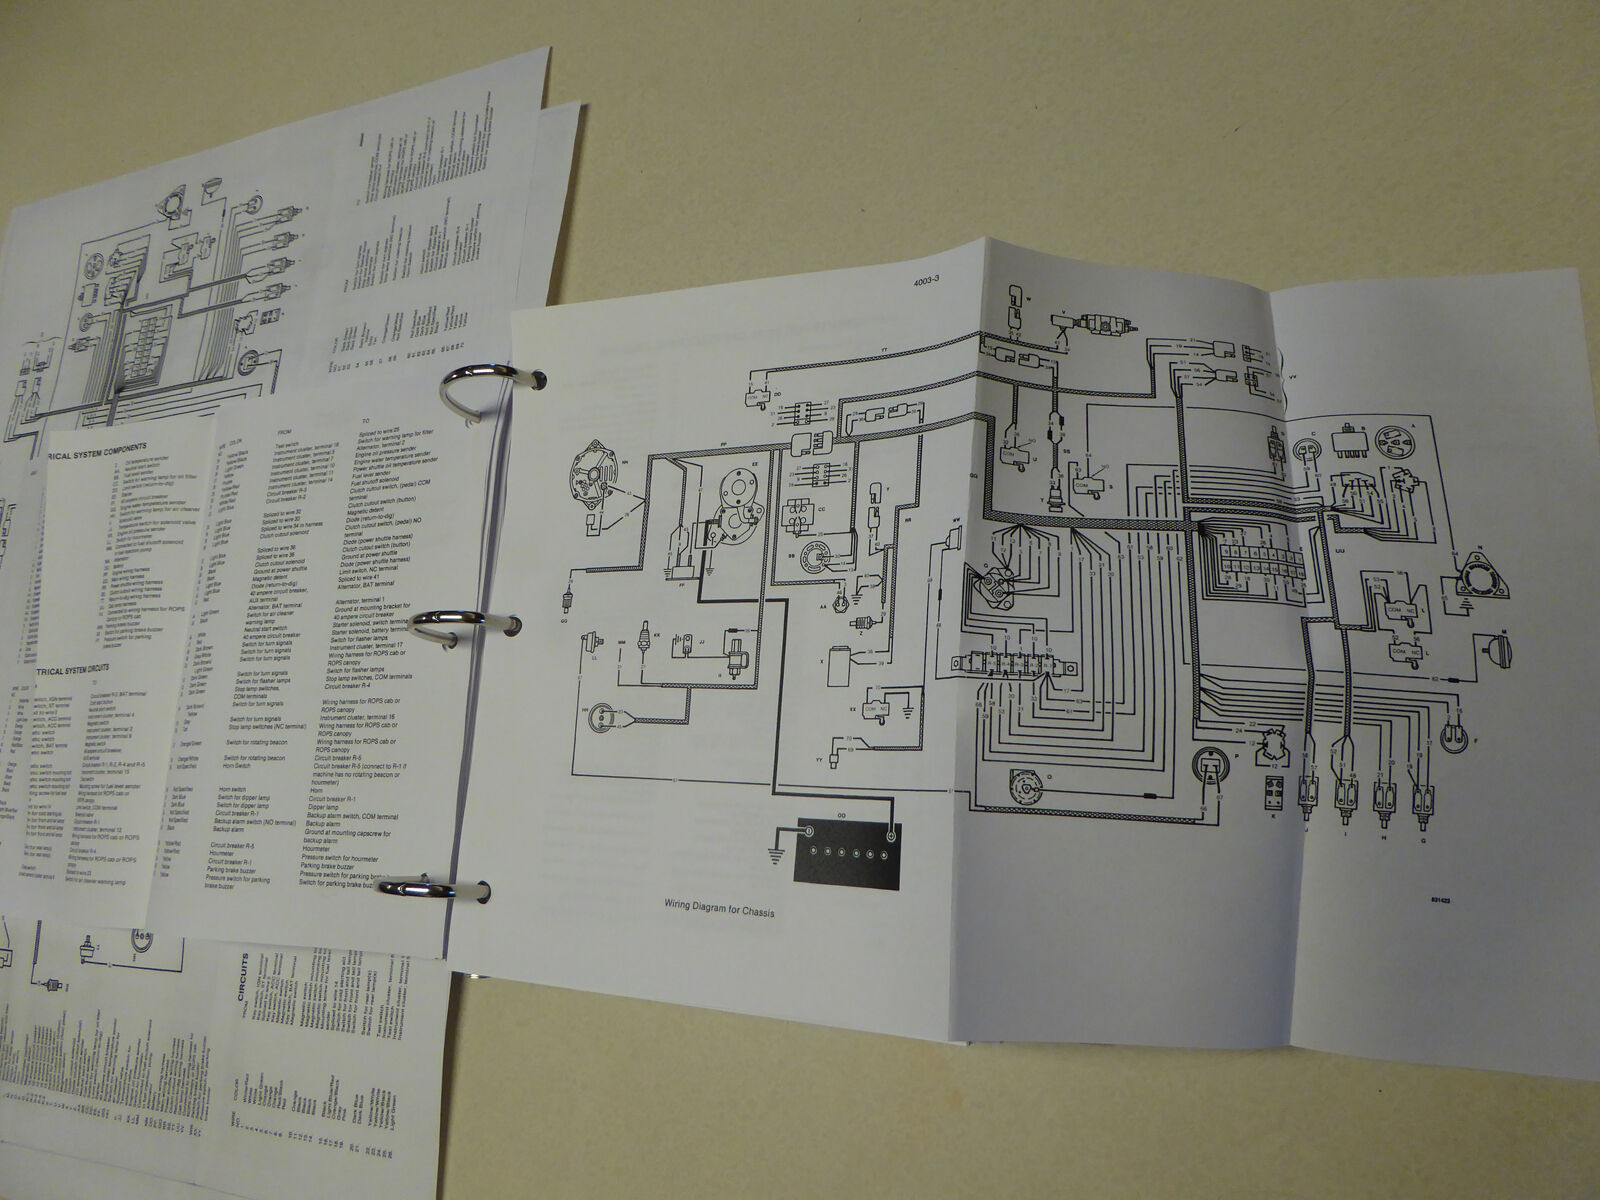 Wiring Diagram Case 580 Se | Wiring Diagram on case backhoe, case bulldozer, case dozer repair, case back hoe parts,